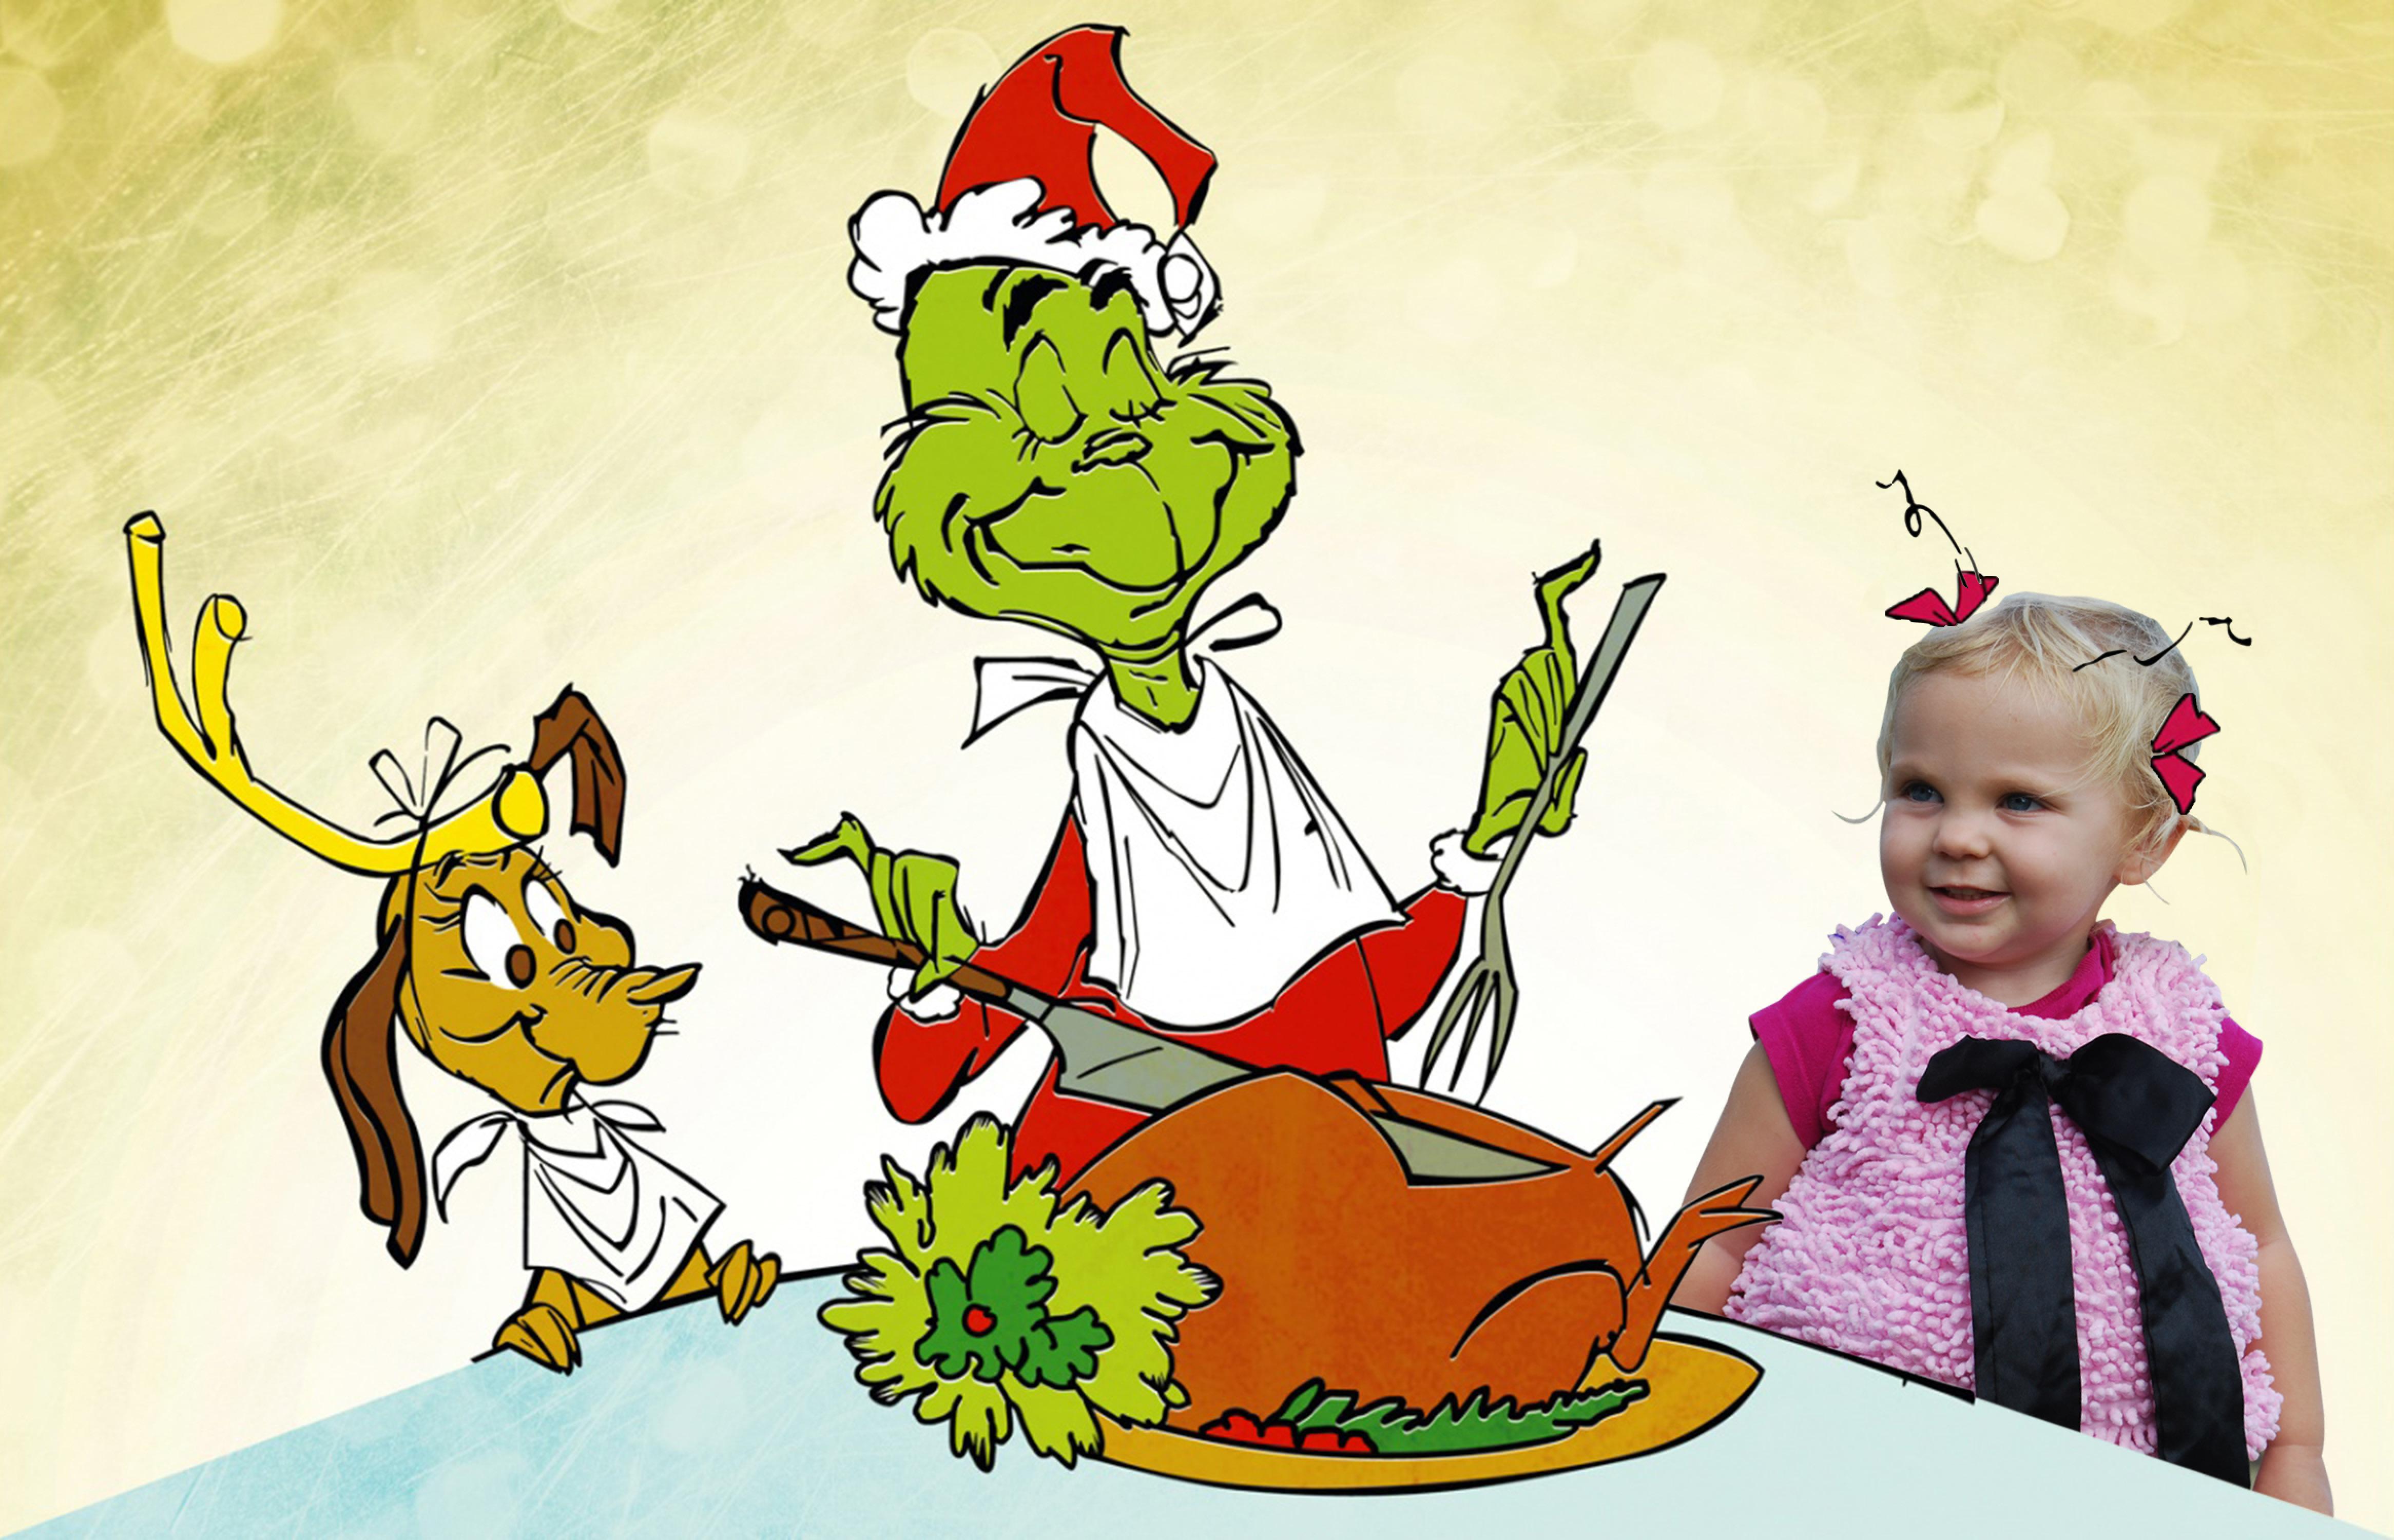 Grinch Stole Christmas Eva